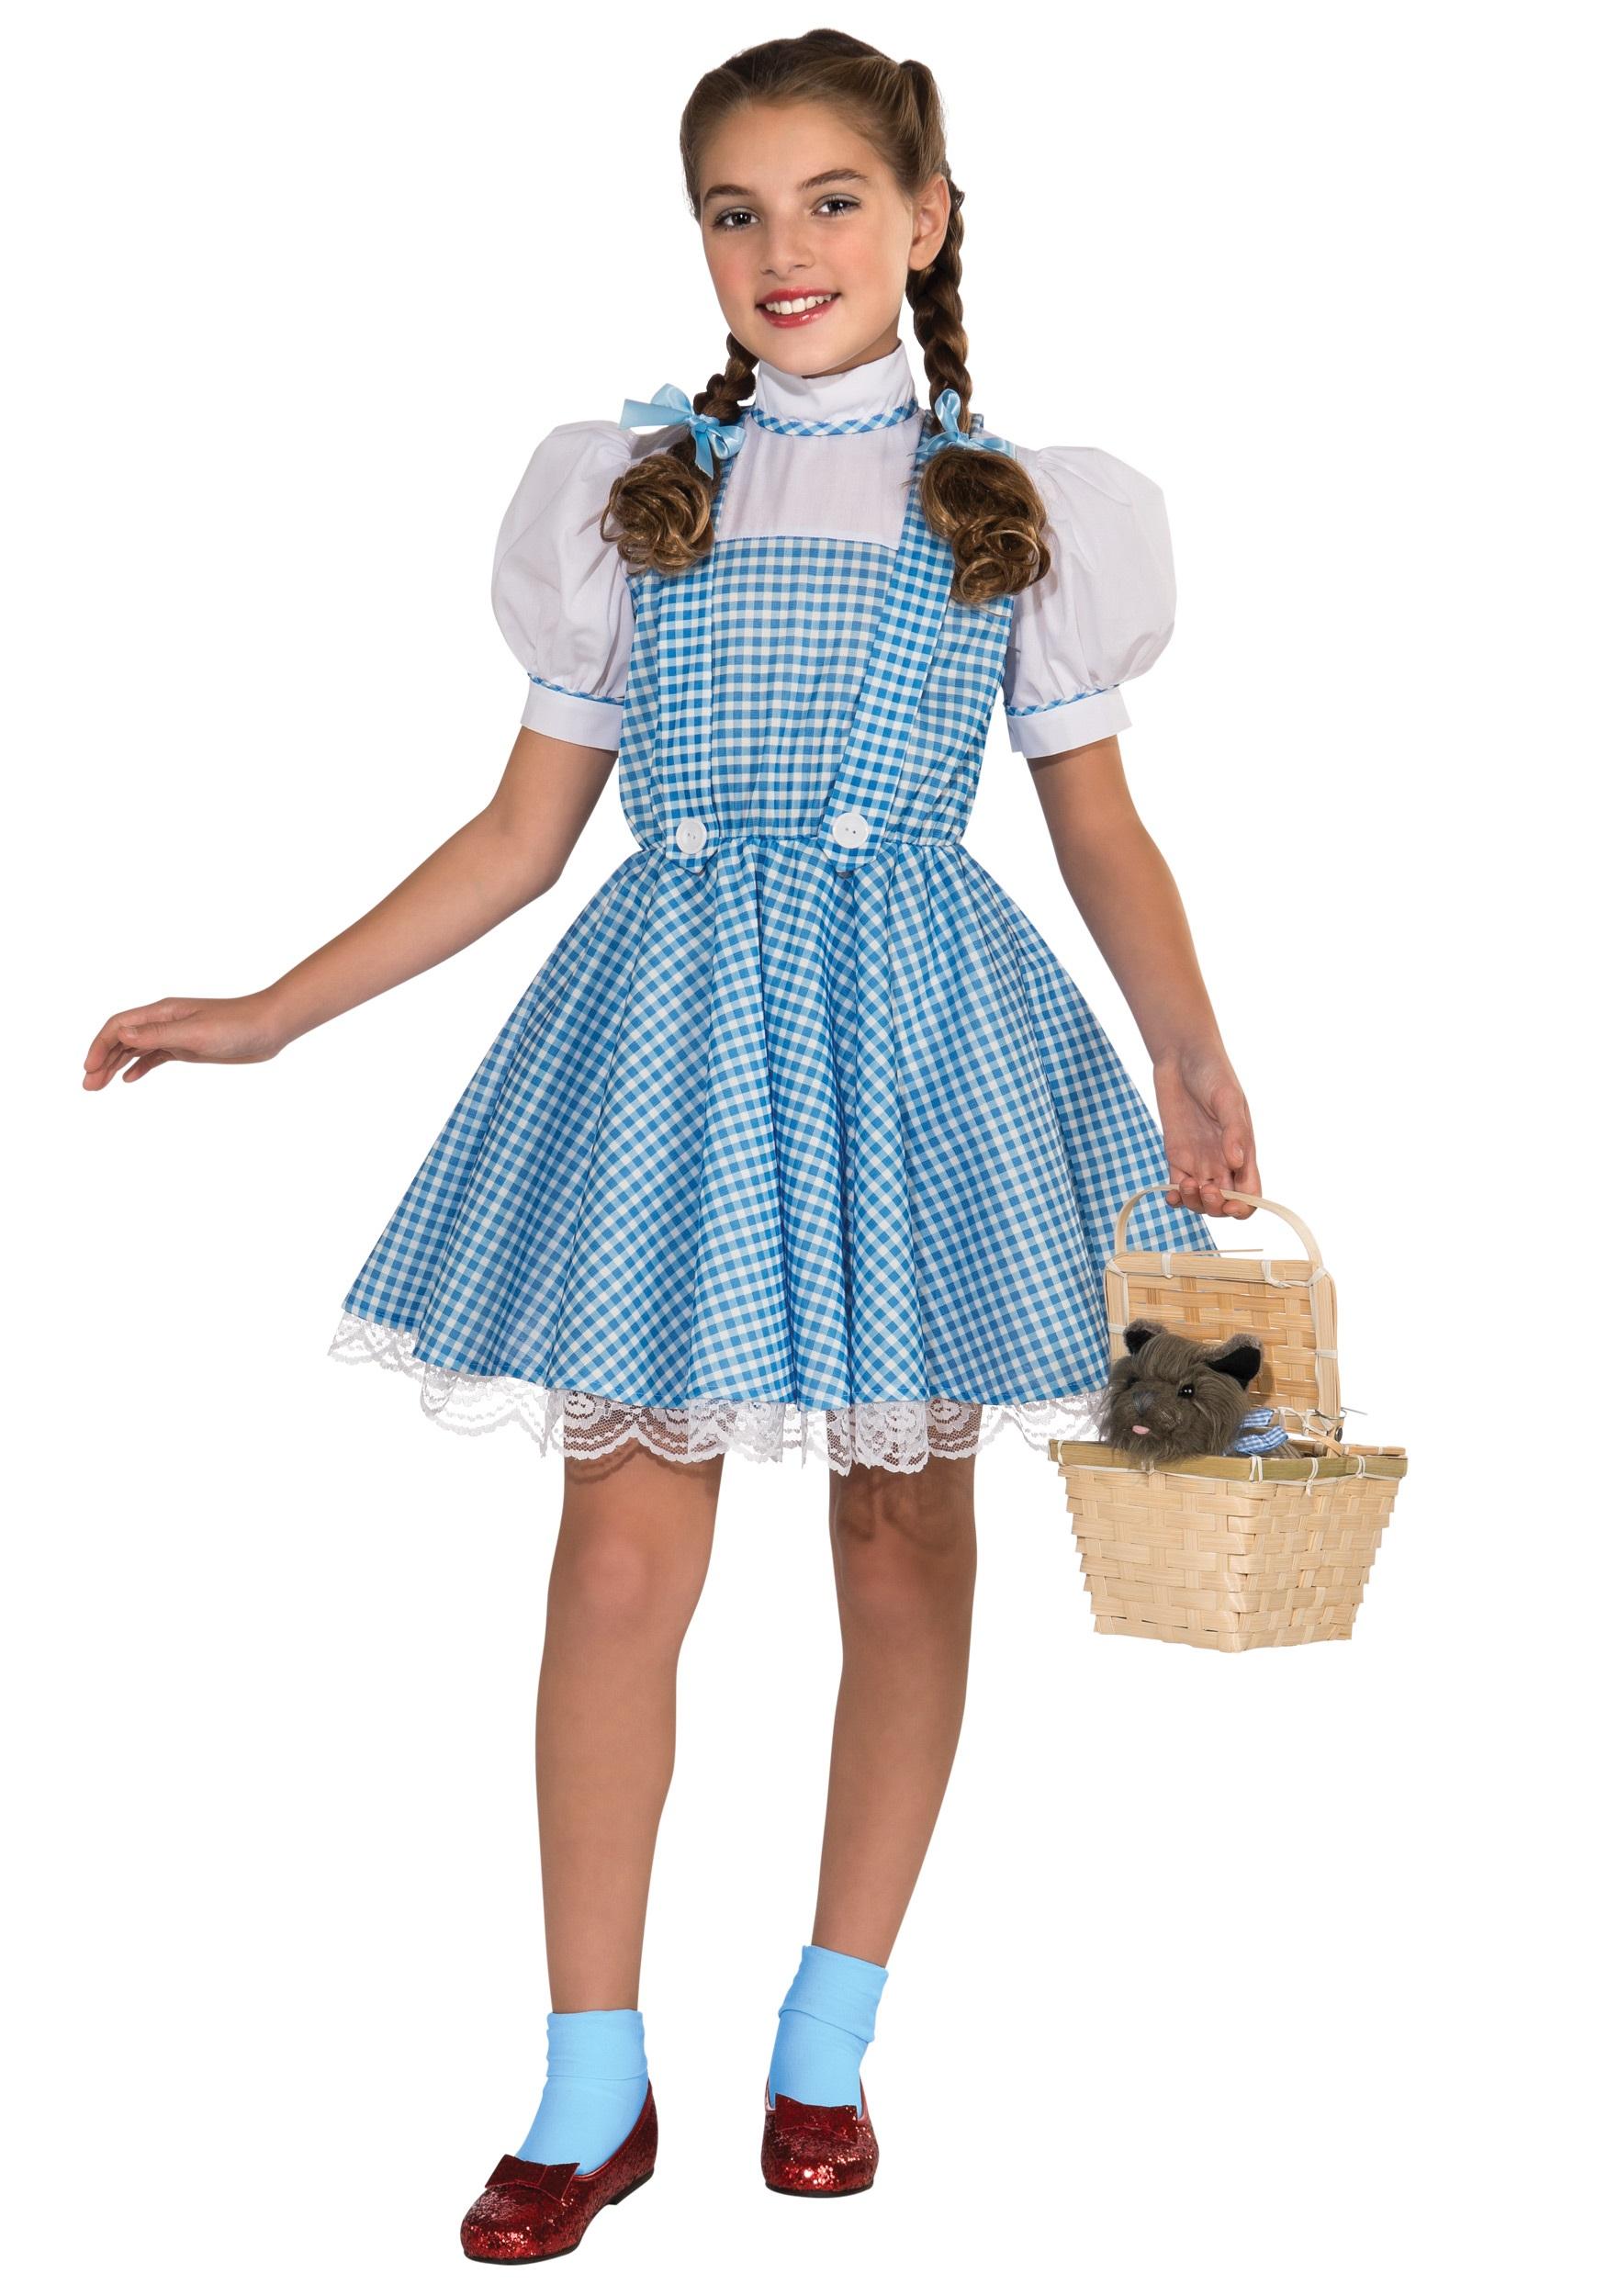 ... avatar · child deluxe dorothy costume ...  sc 1 st  Best Kids Costumes & Avatar Costumes For Kids - Best Kids Costumes